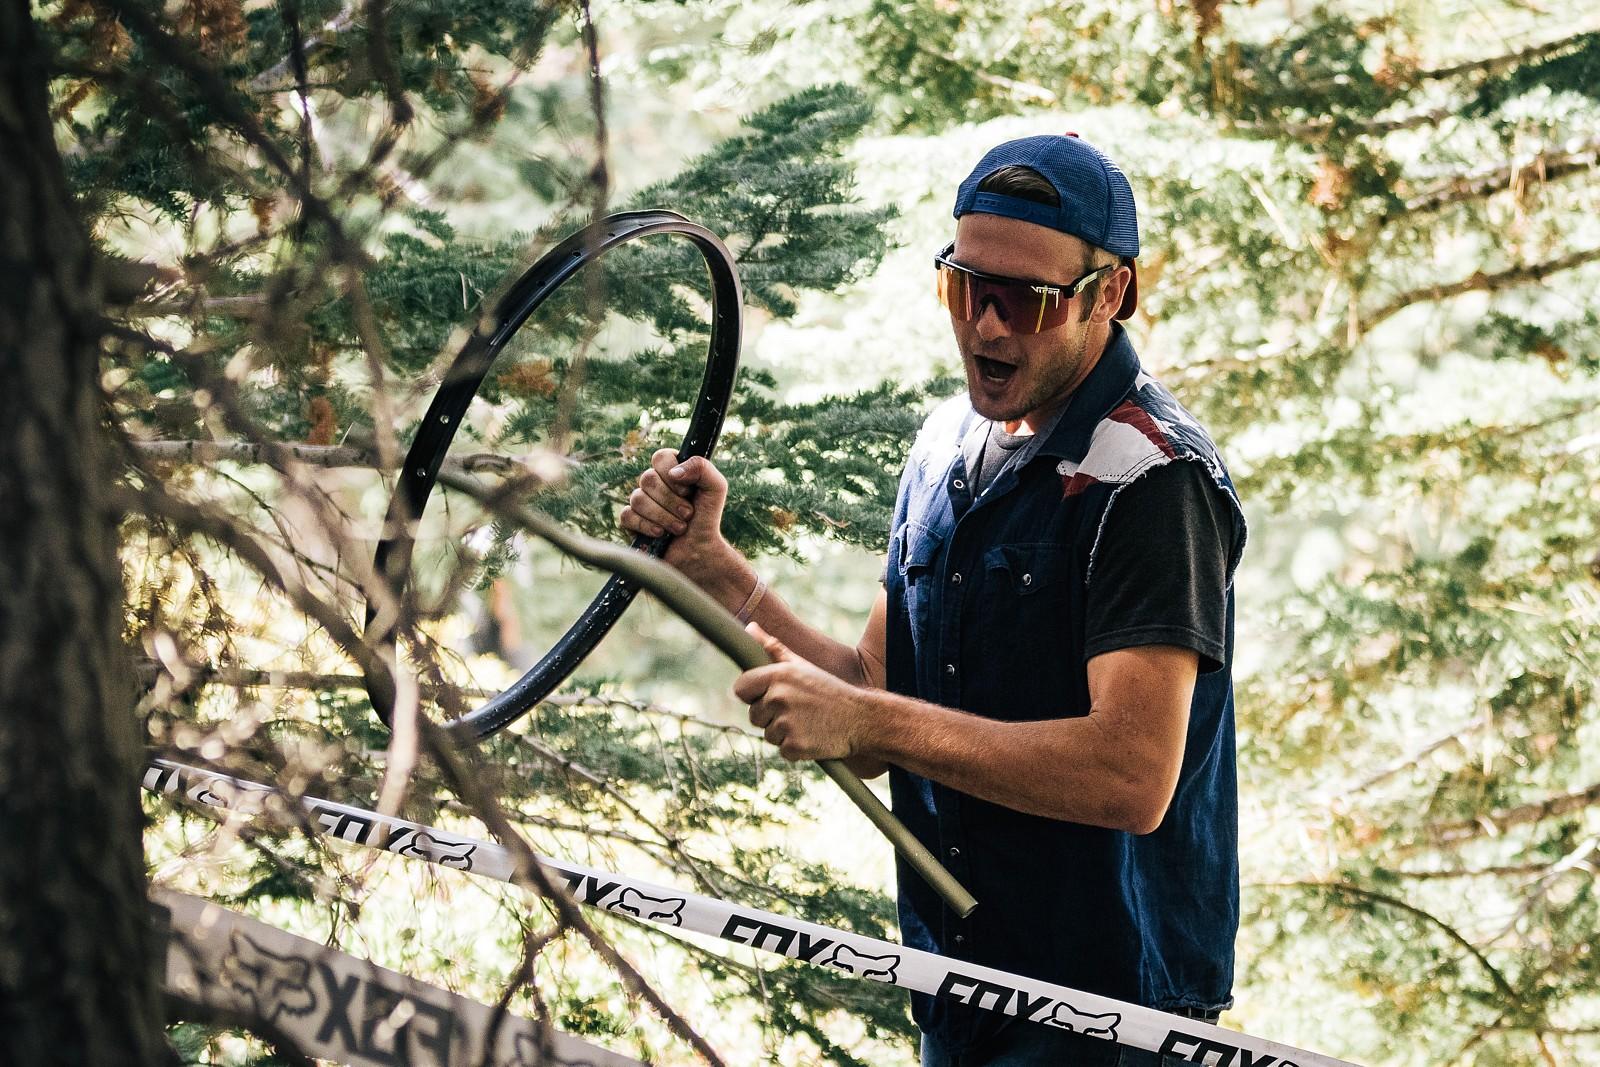 2019USOpenMTB DH yellow-3 - ALeedomPhotography - Mountain Biking Pictures - Vital MTB